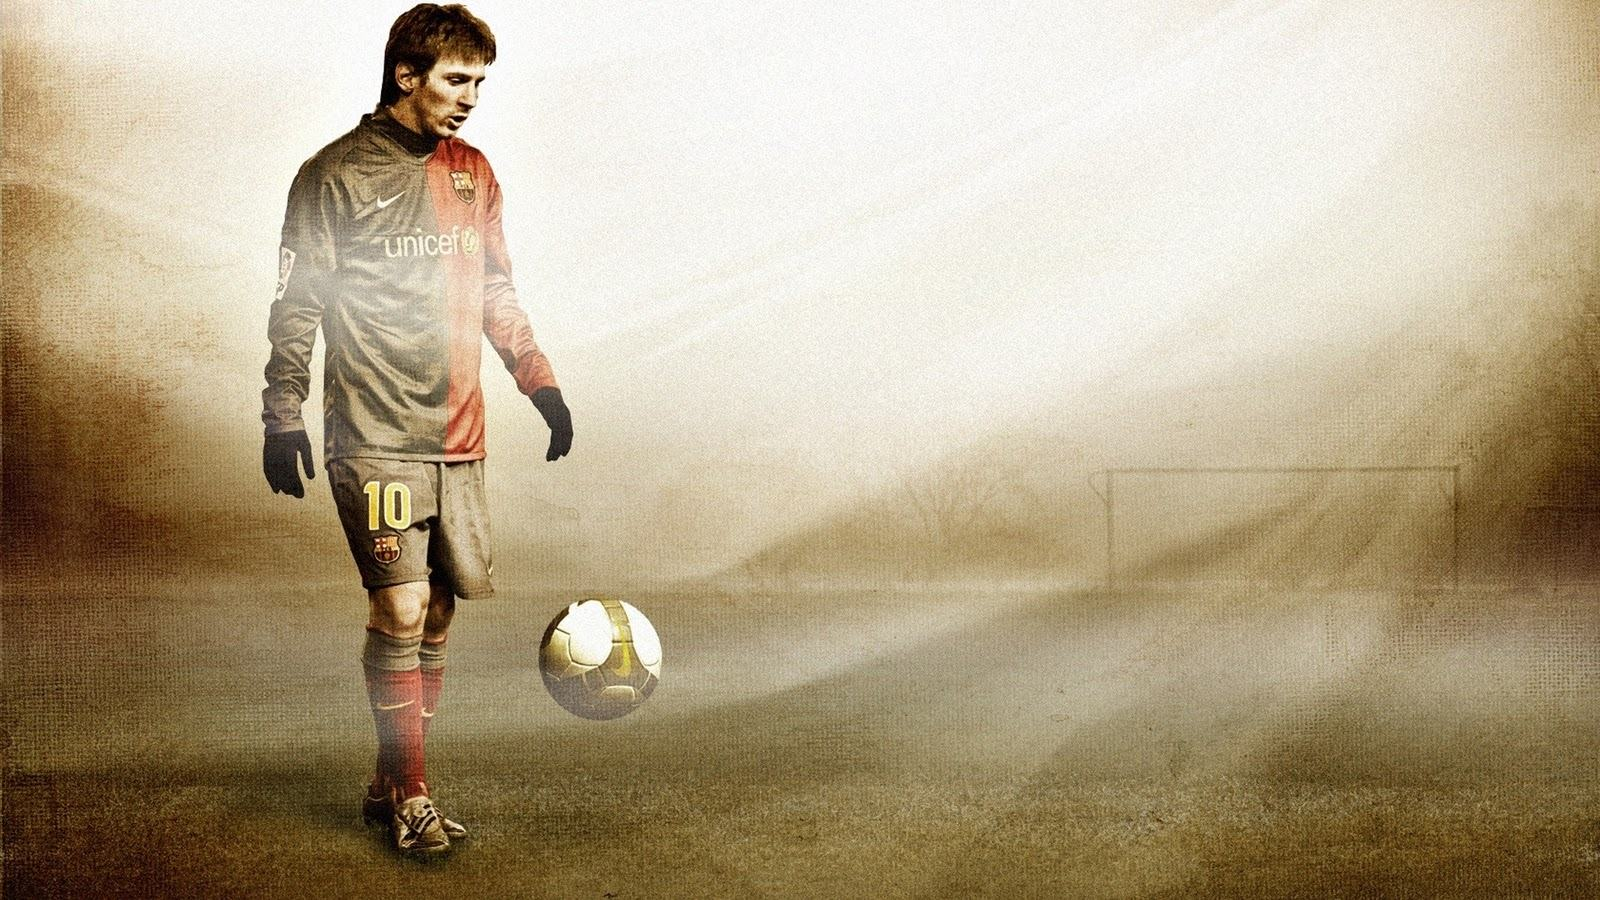 Leo Messi Hd Wallpaper Image Wallpapers 1600x900